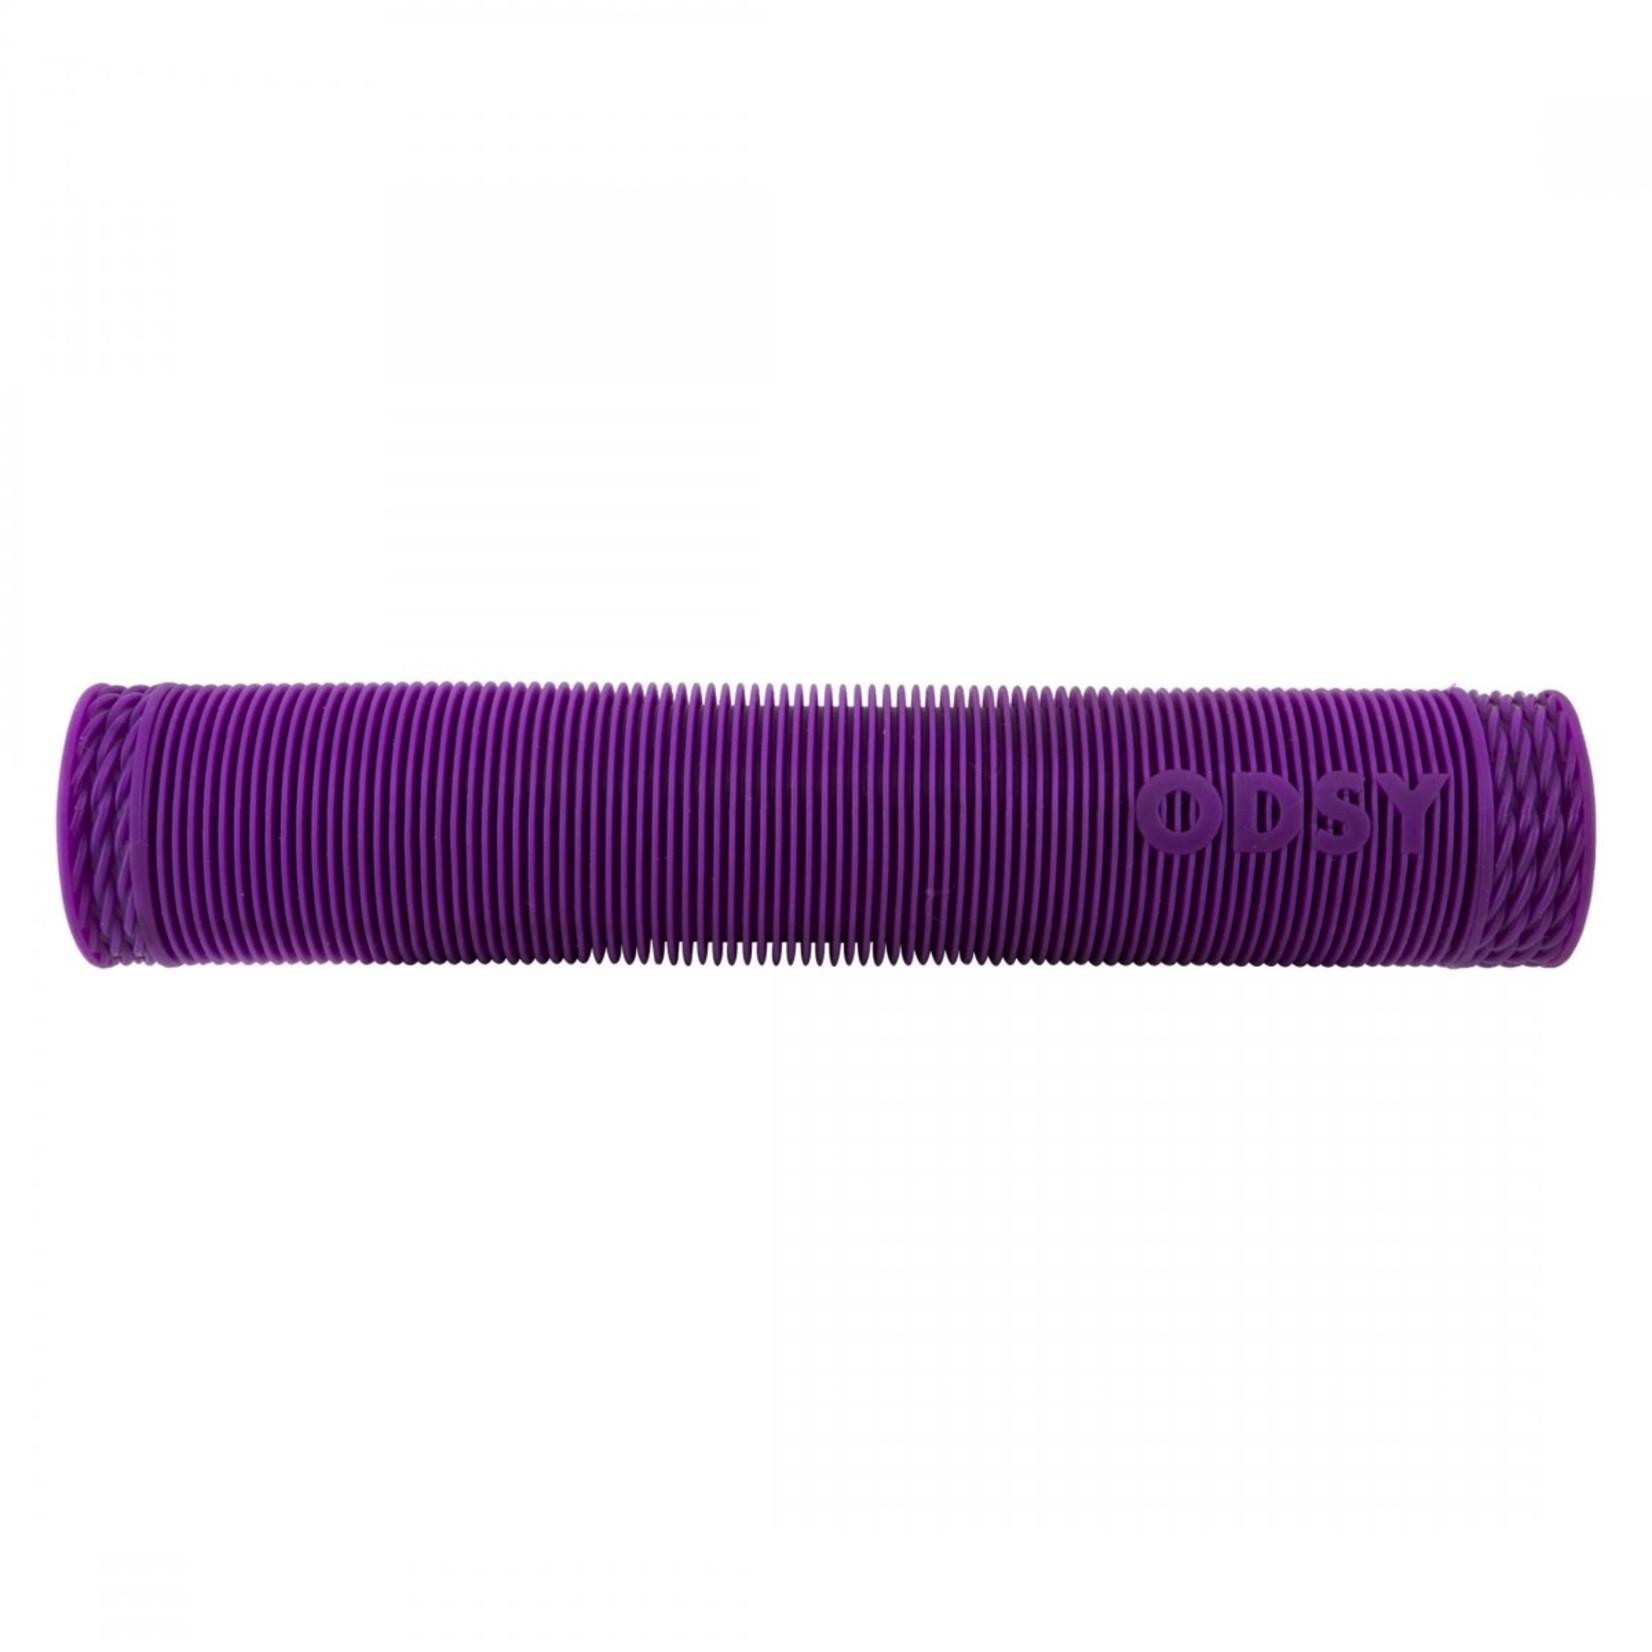 Odyssey BROC Grips 160mm - Purple